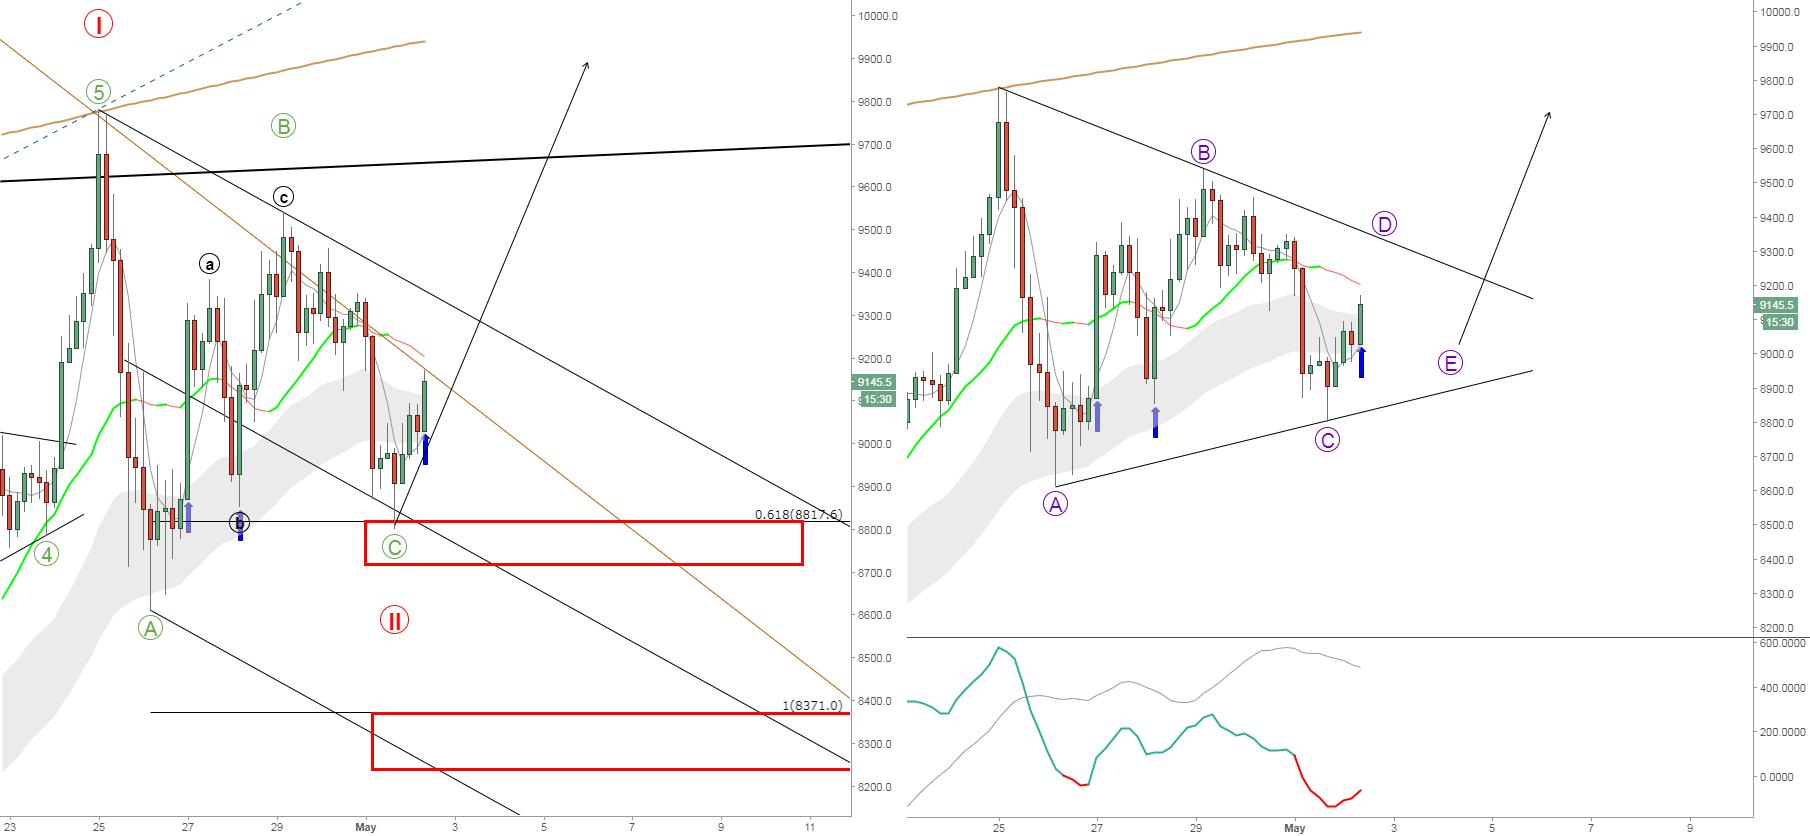 Bitcoin. Market's Setup. Bull trend